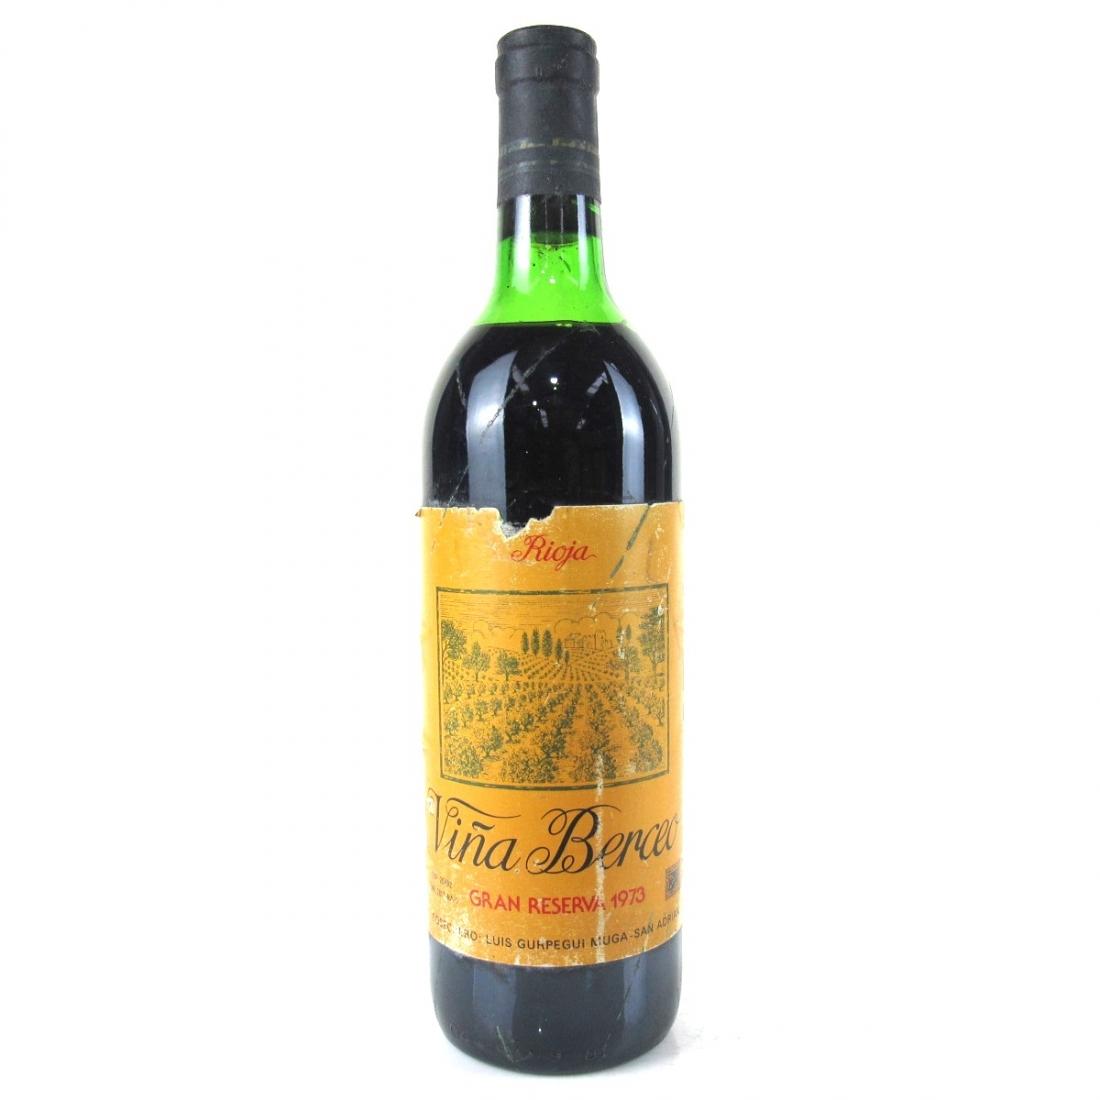 Viña Berceo 1973 Rioja Gran Reserva